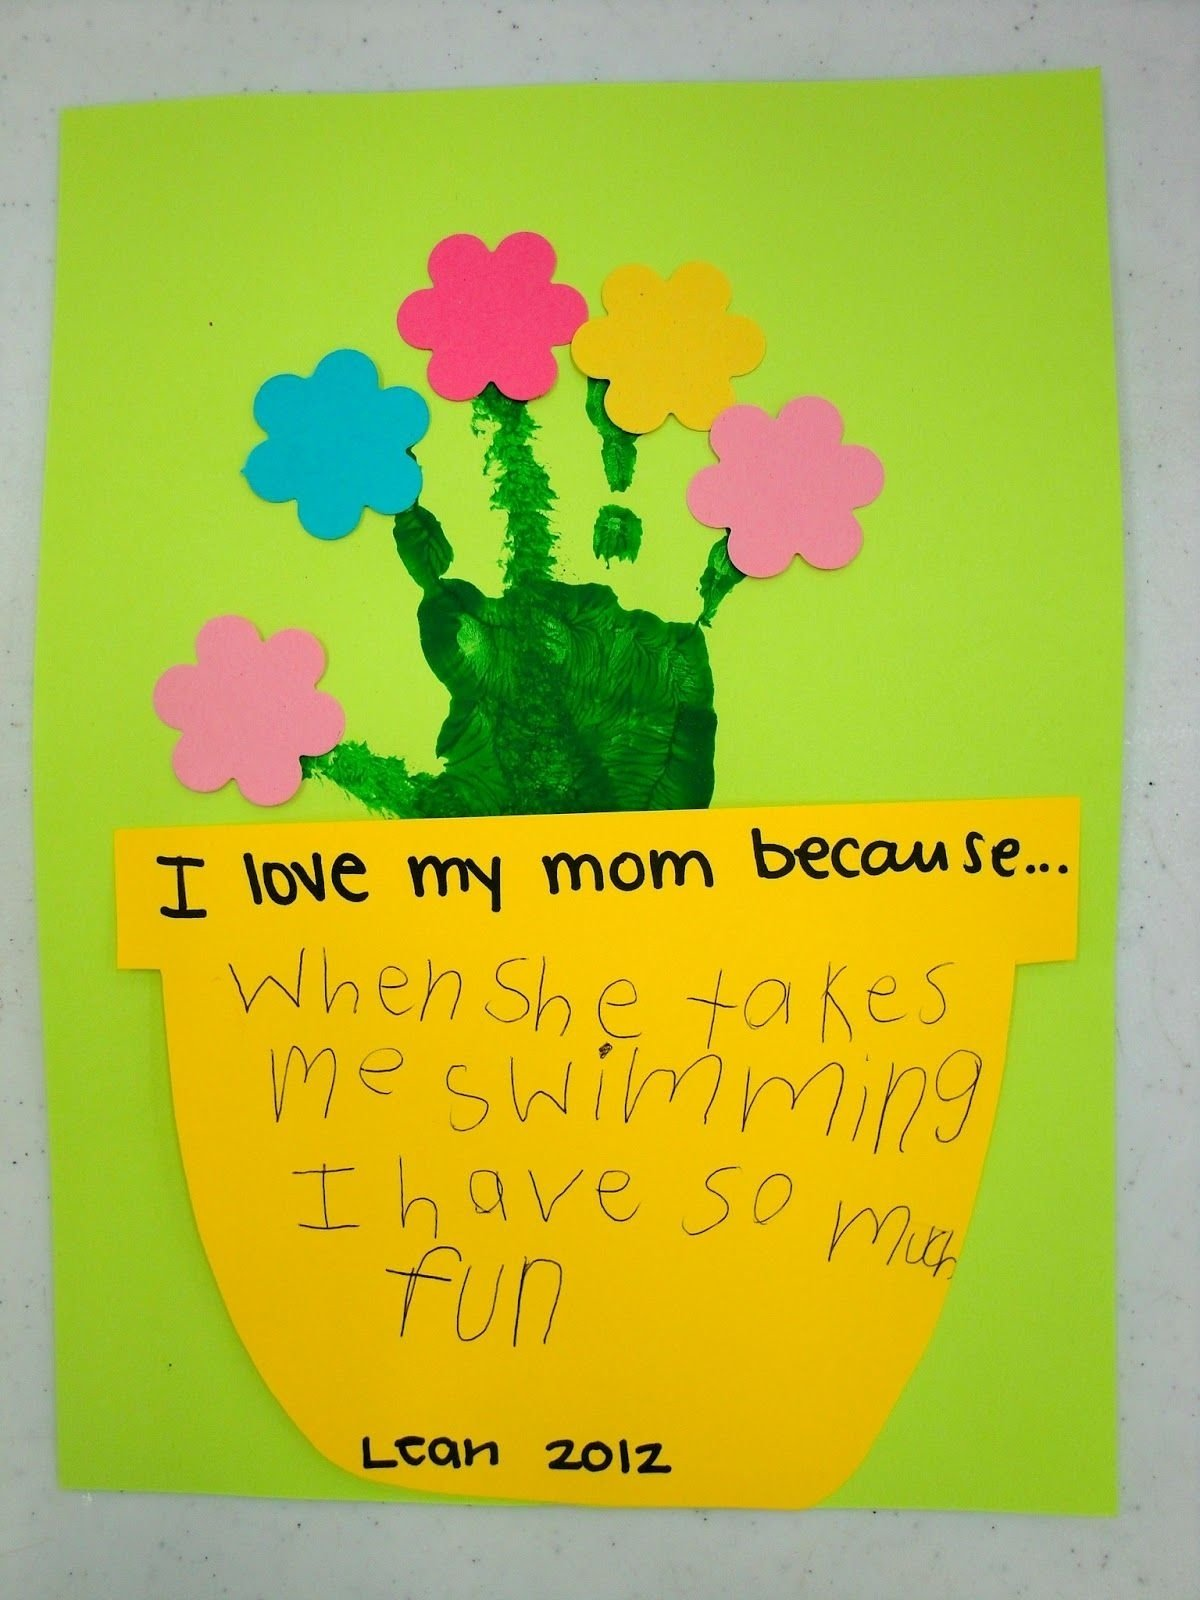 10 Spectacular Mothers Day Ideas For Kids mothers day crafts kindergarten ideas pinterest craft school 2